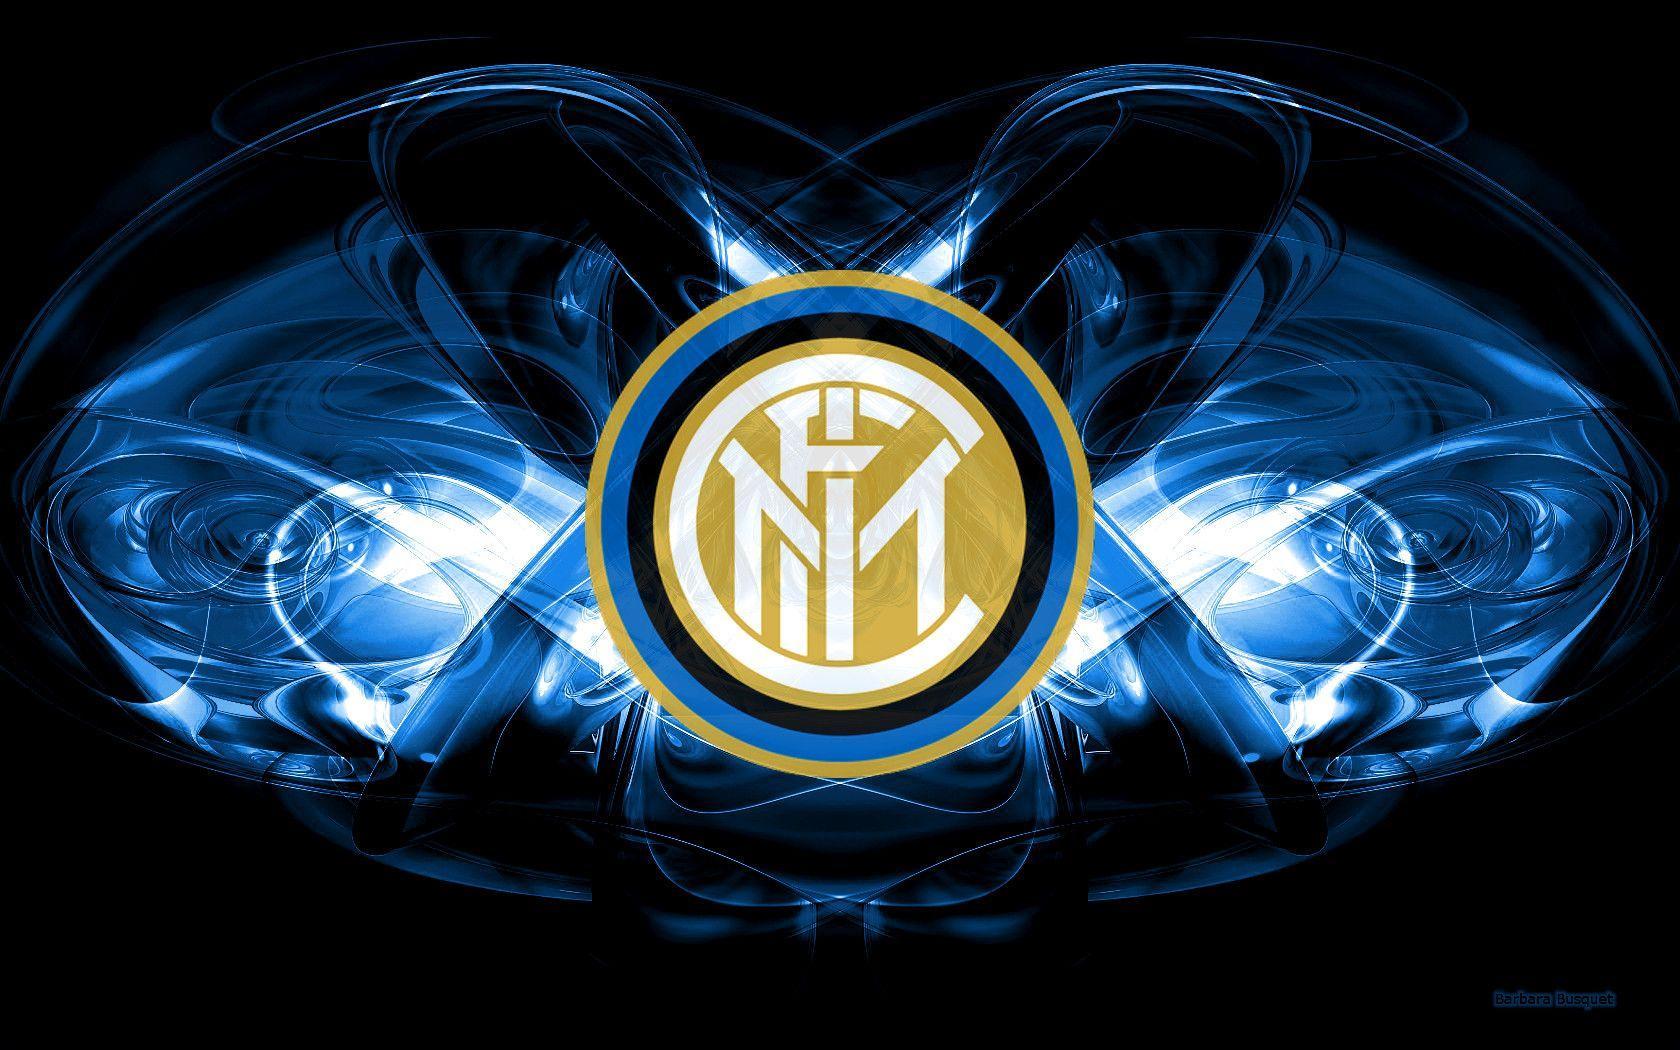 Inter Milan 2018 Wallpapers Wallpaper Cave